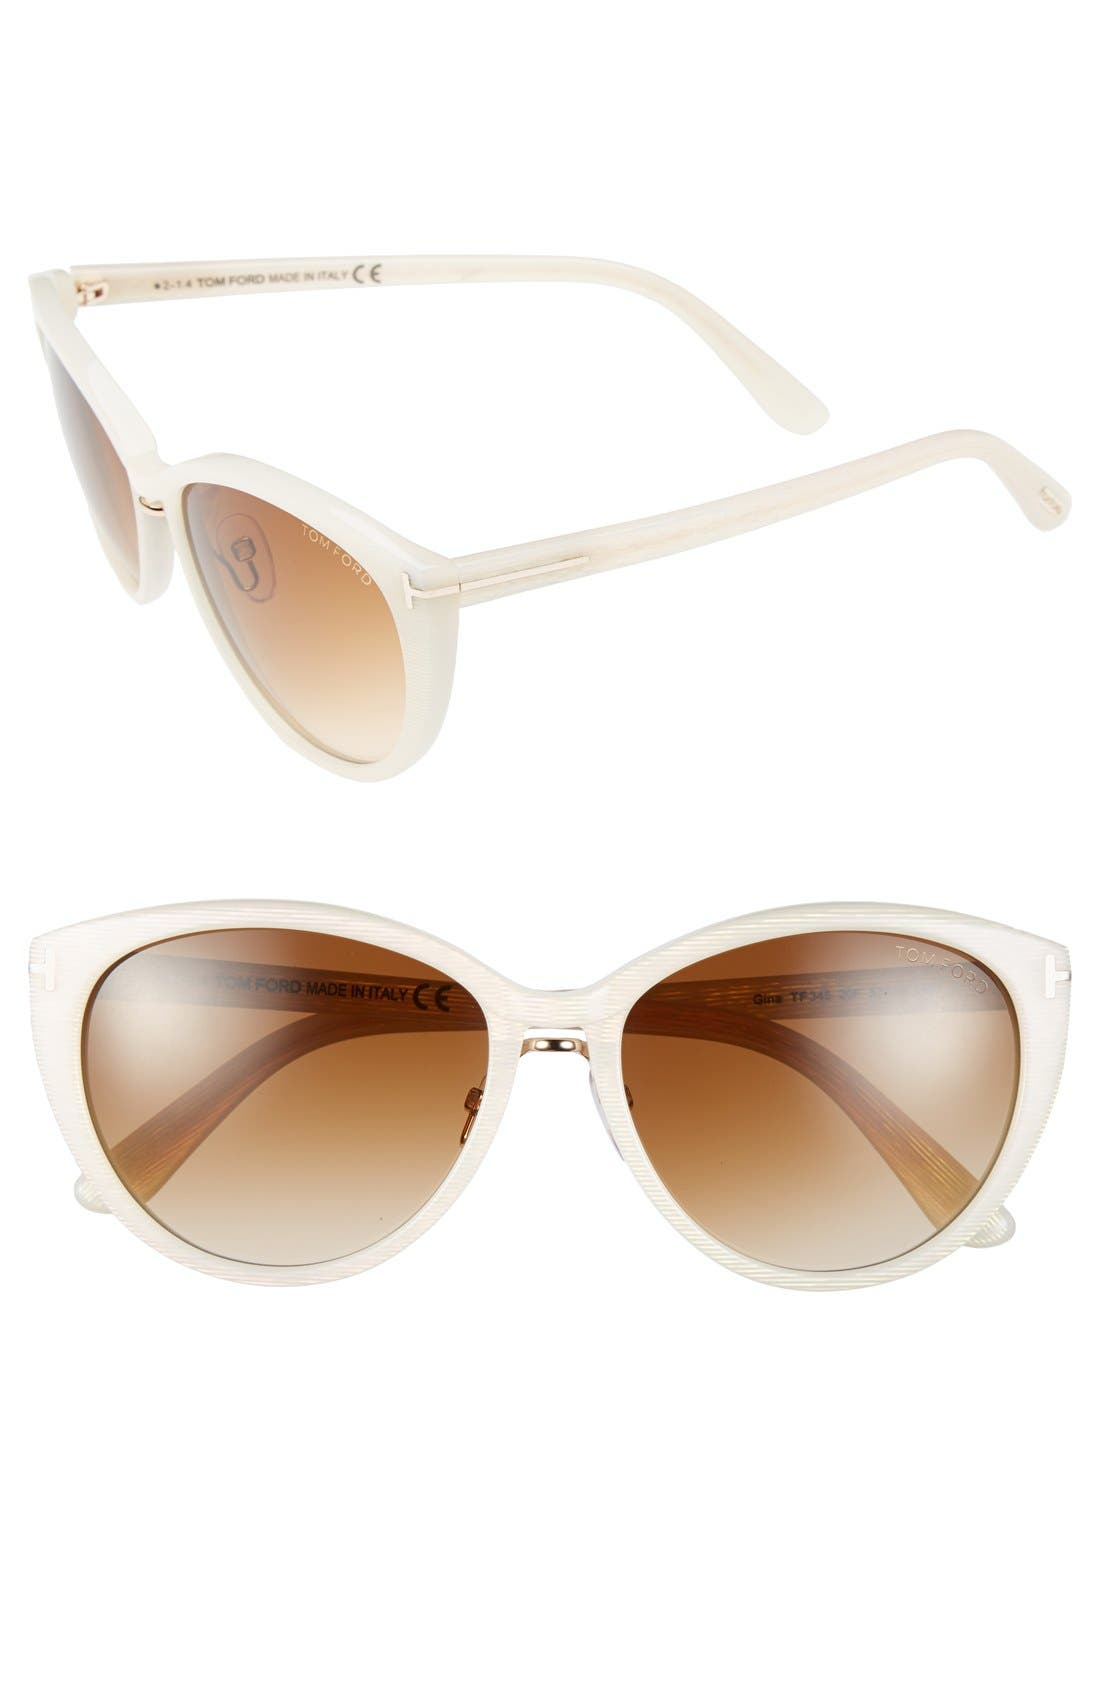 Main Image - Tom Ford 'Gina' 57mm Cat Eye Sunglasses